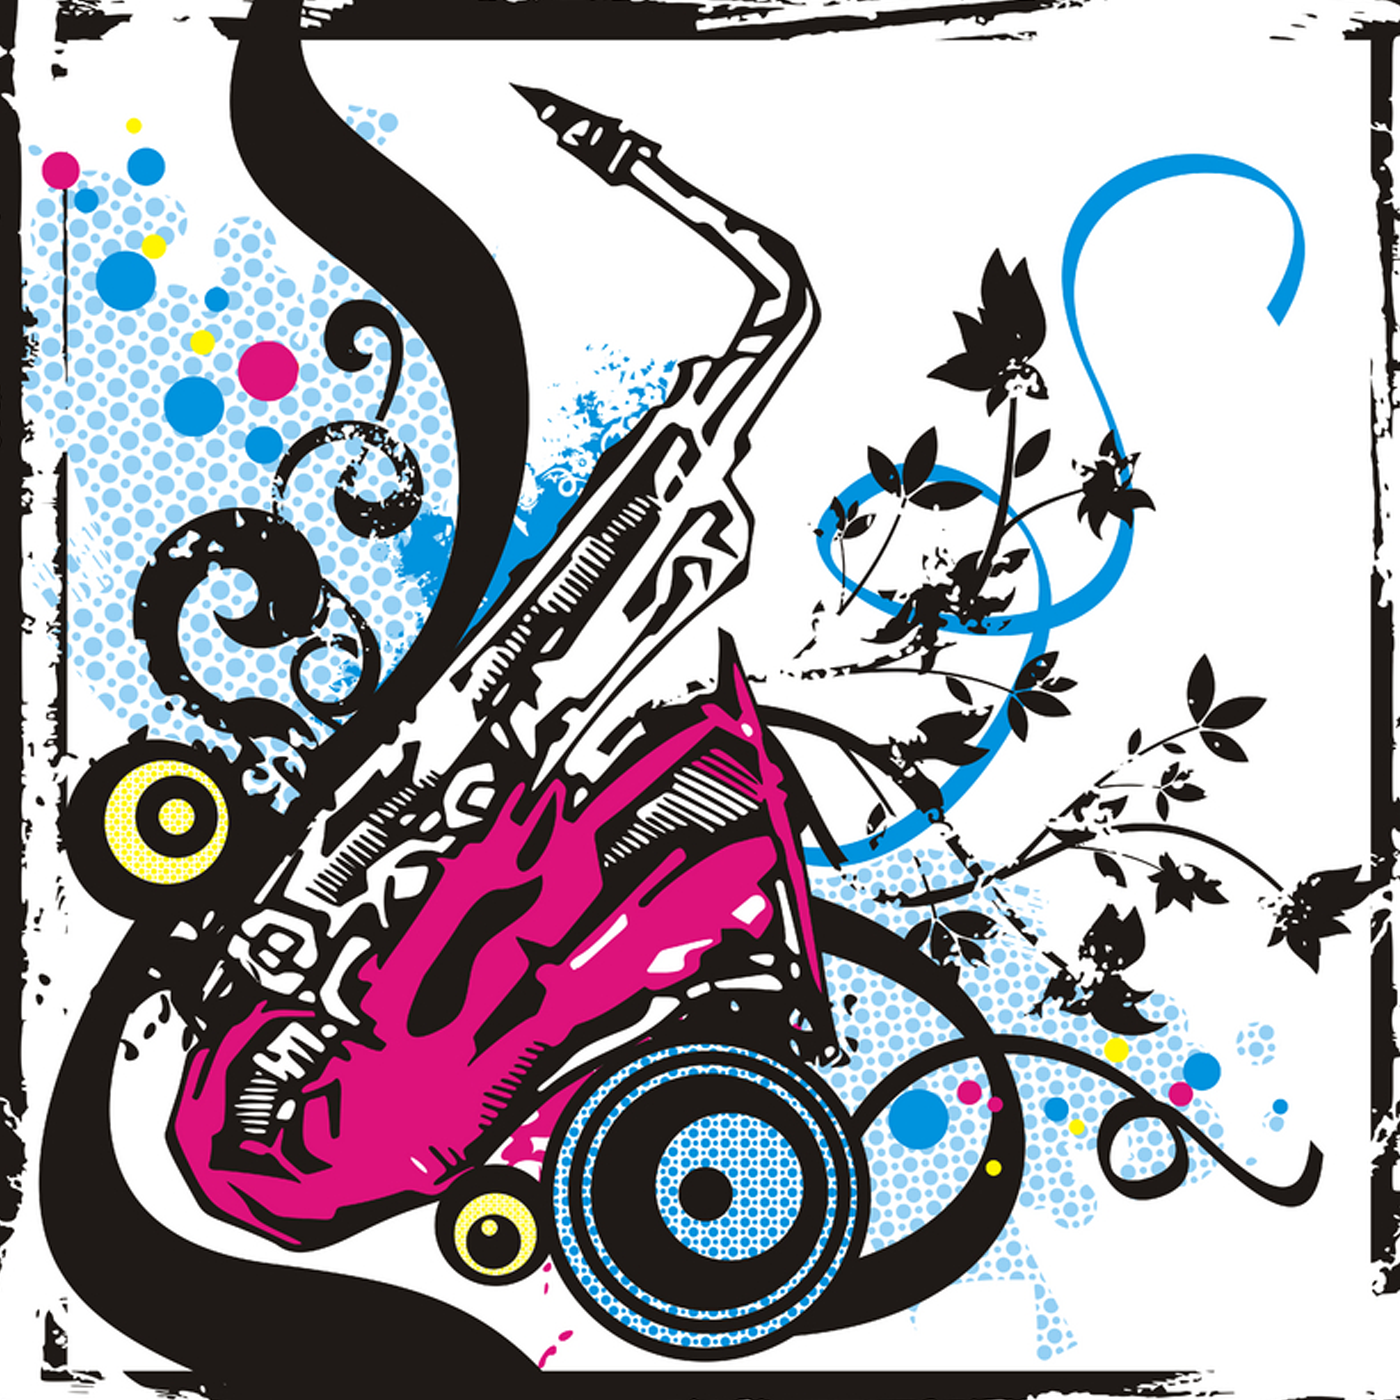 Go Premium - JAZZRADIO com - enjoy great jazz music